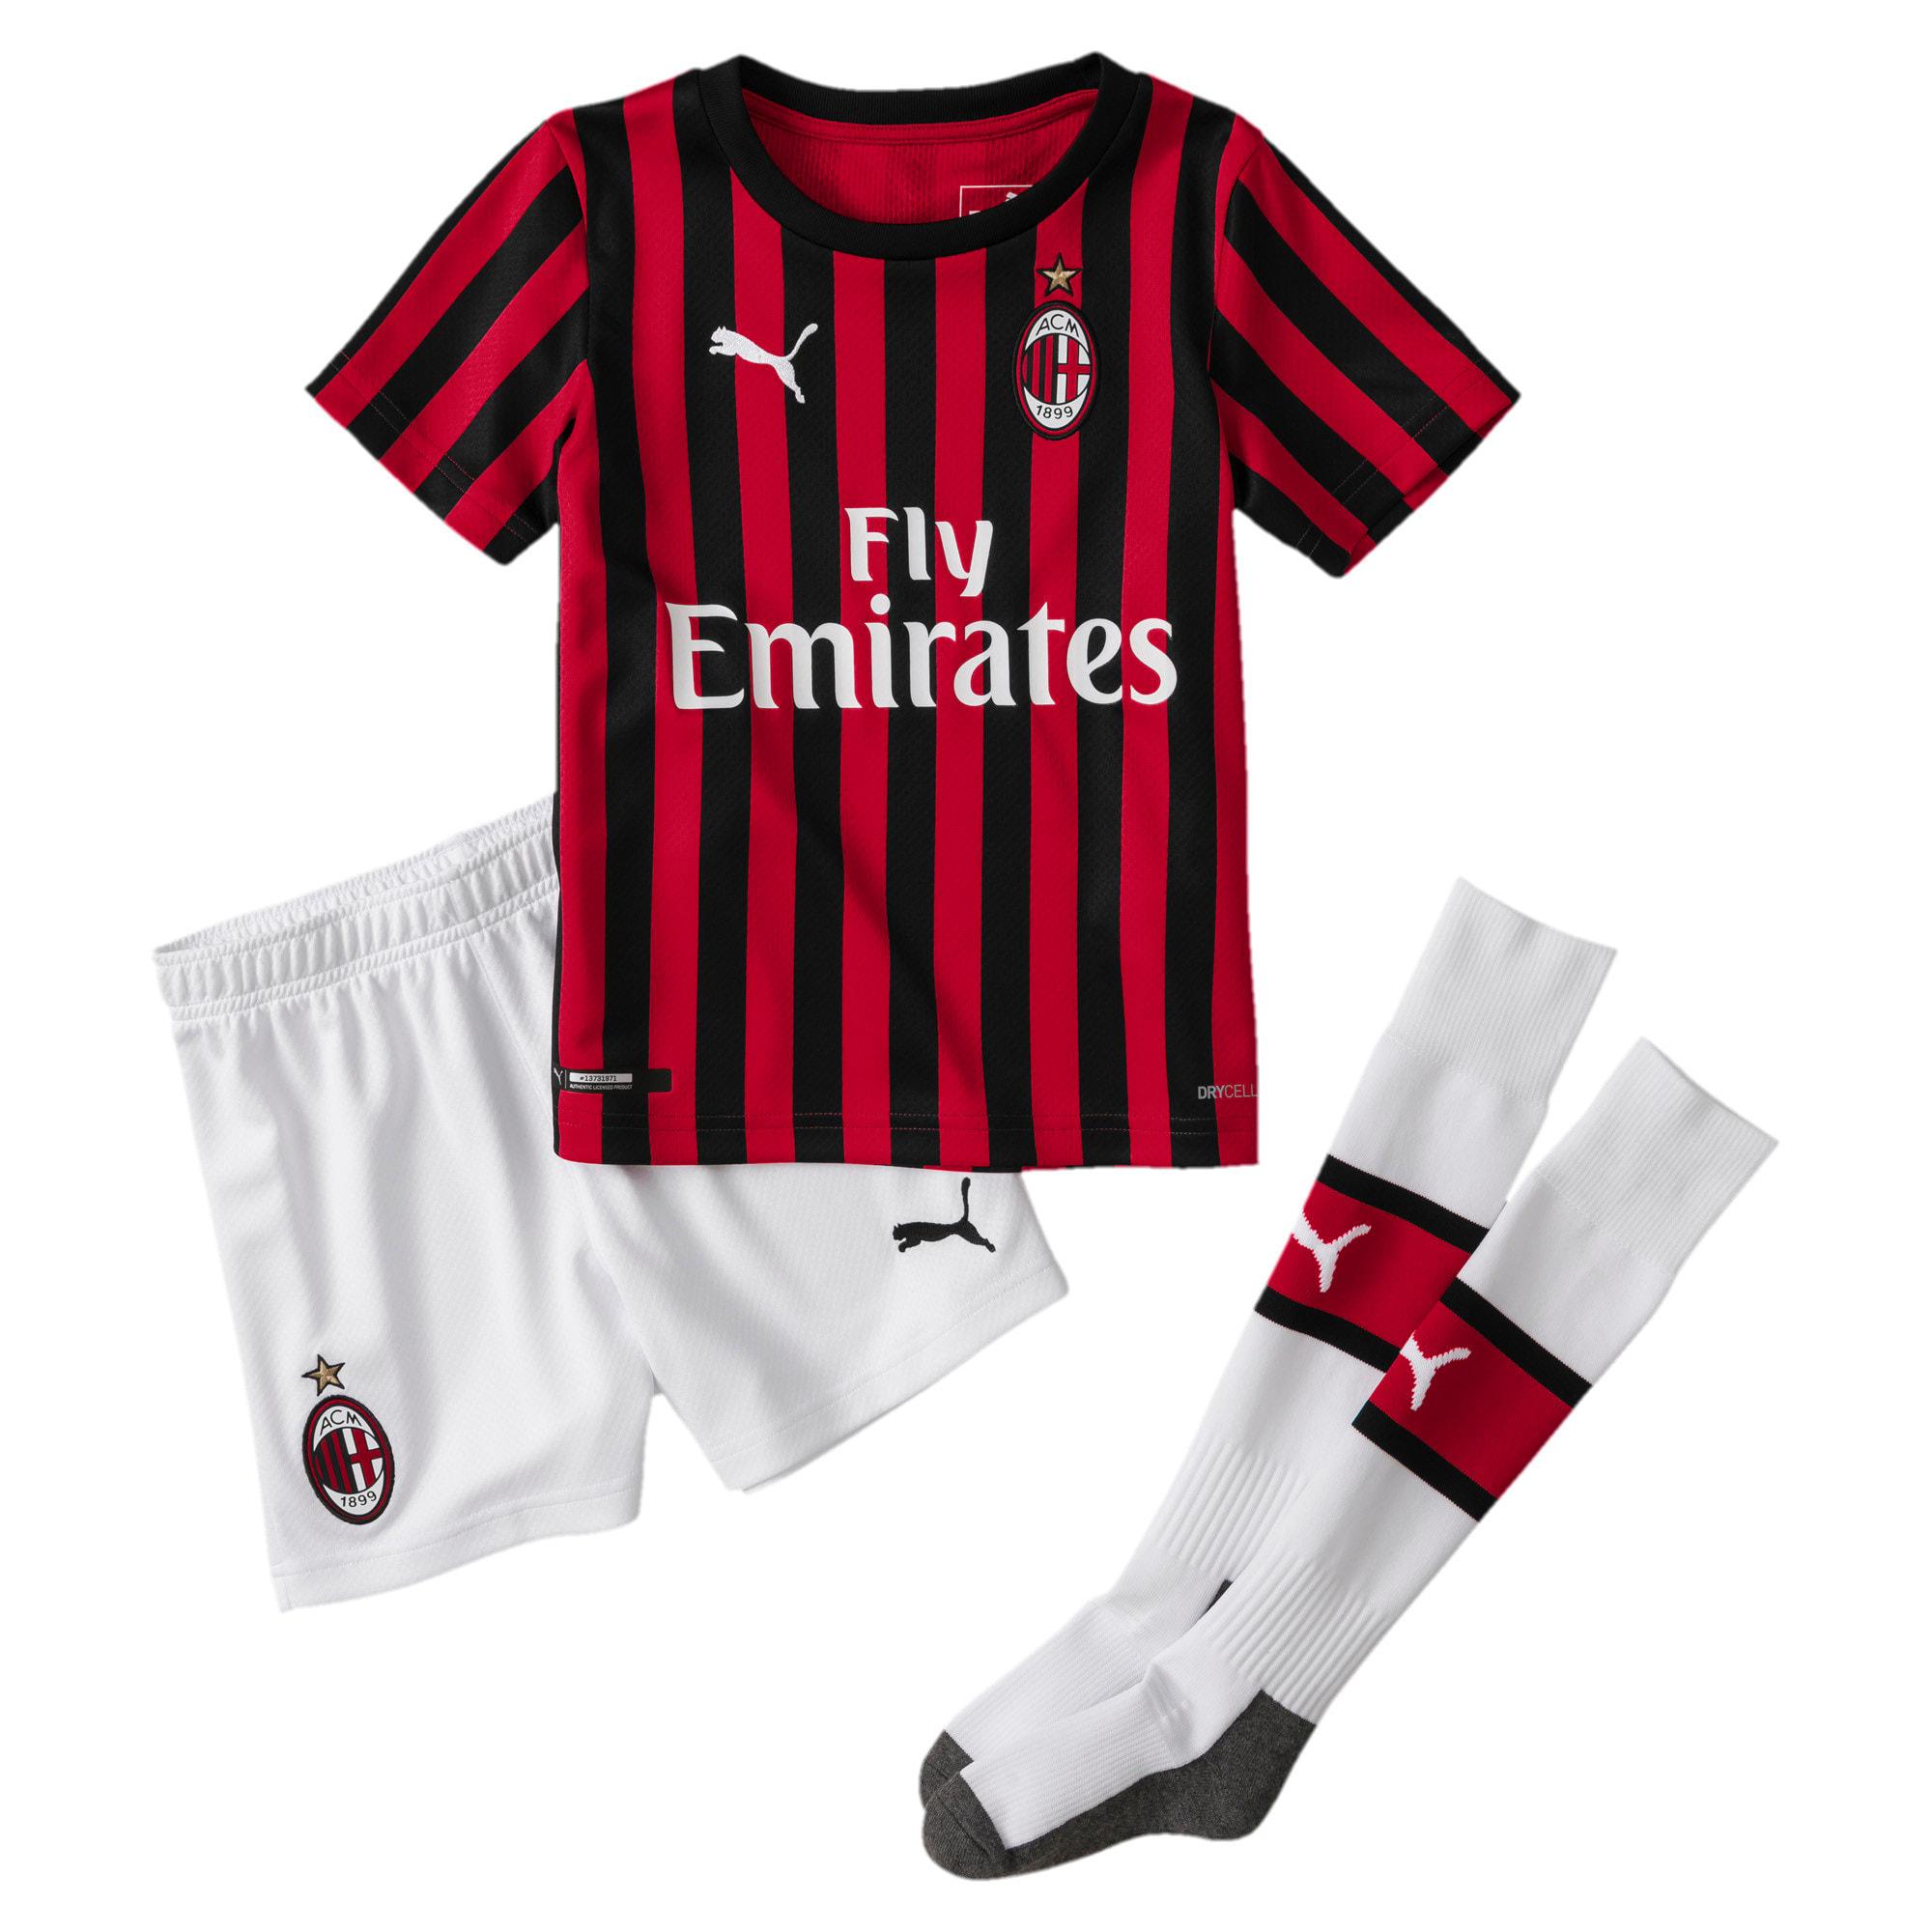 Thumbnail 1 of AC Milan Home Replica Mini Kit, Tango Red -Puma Black, medium